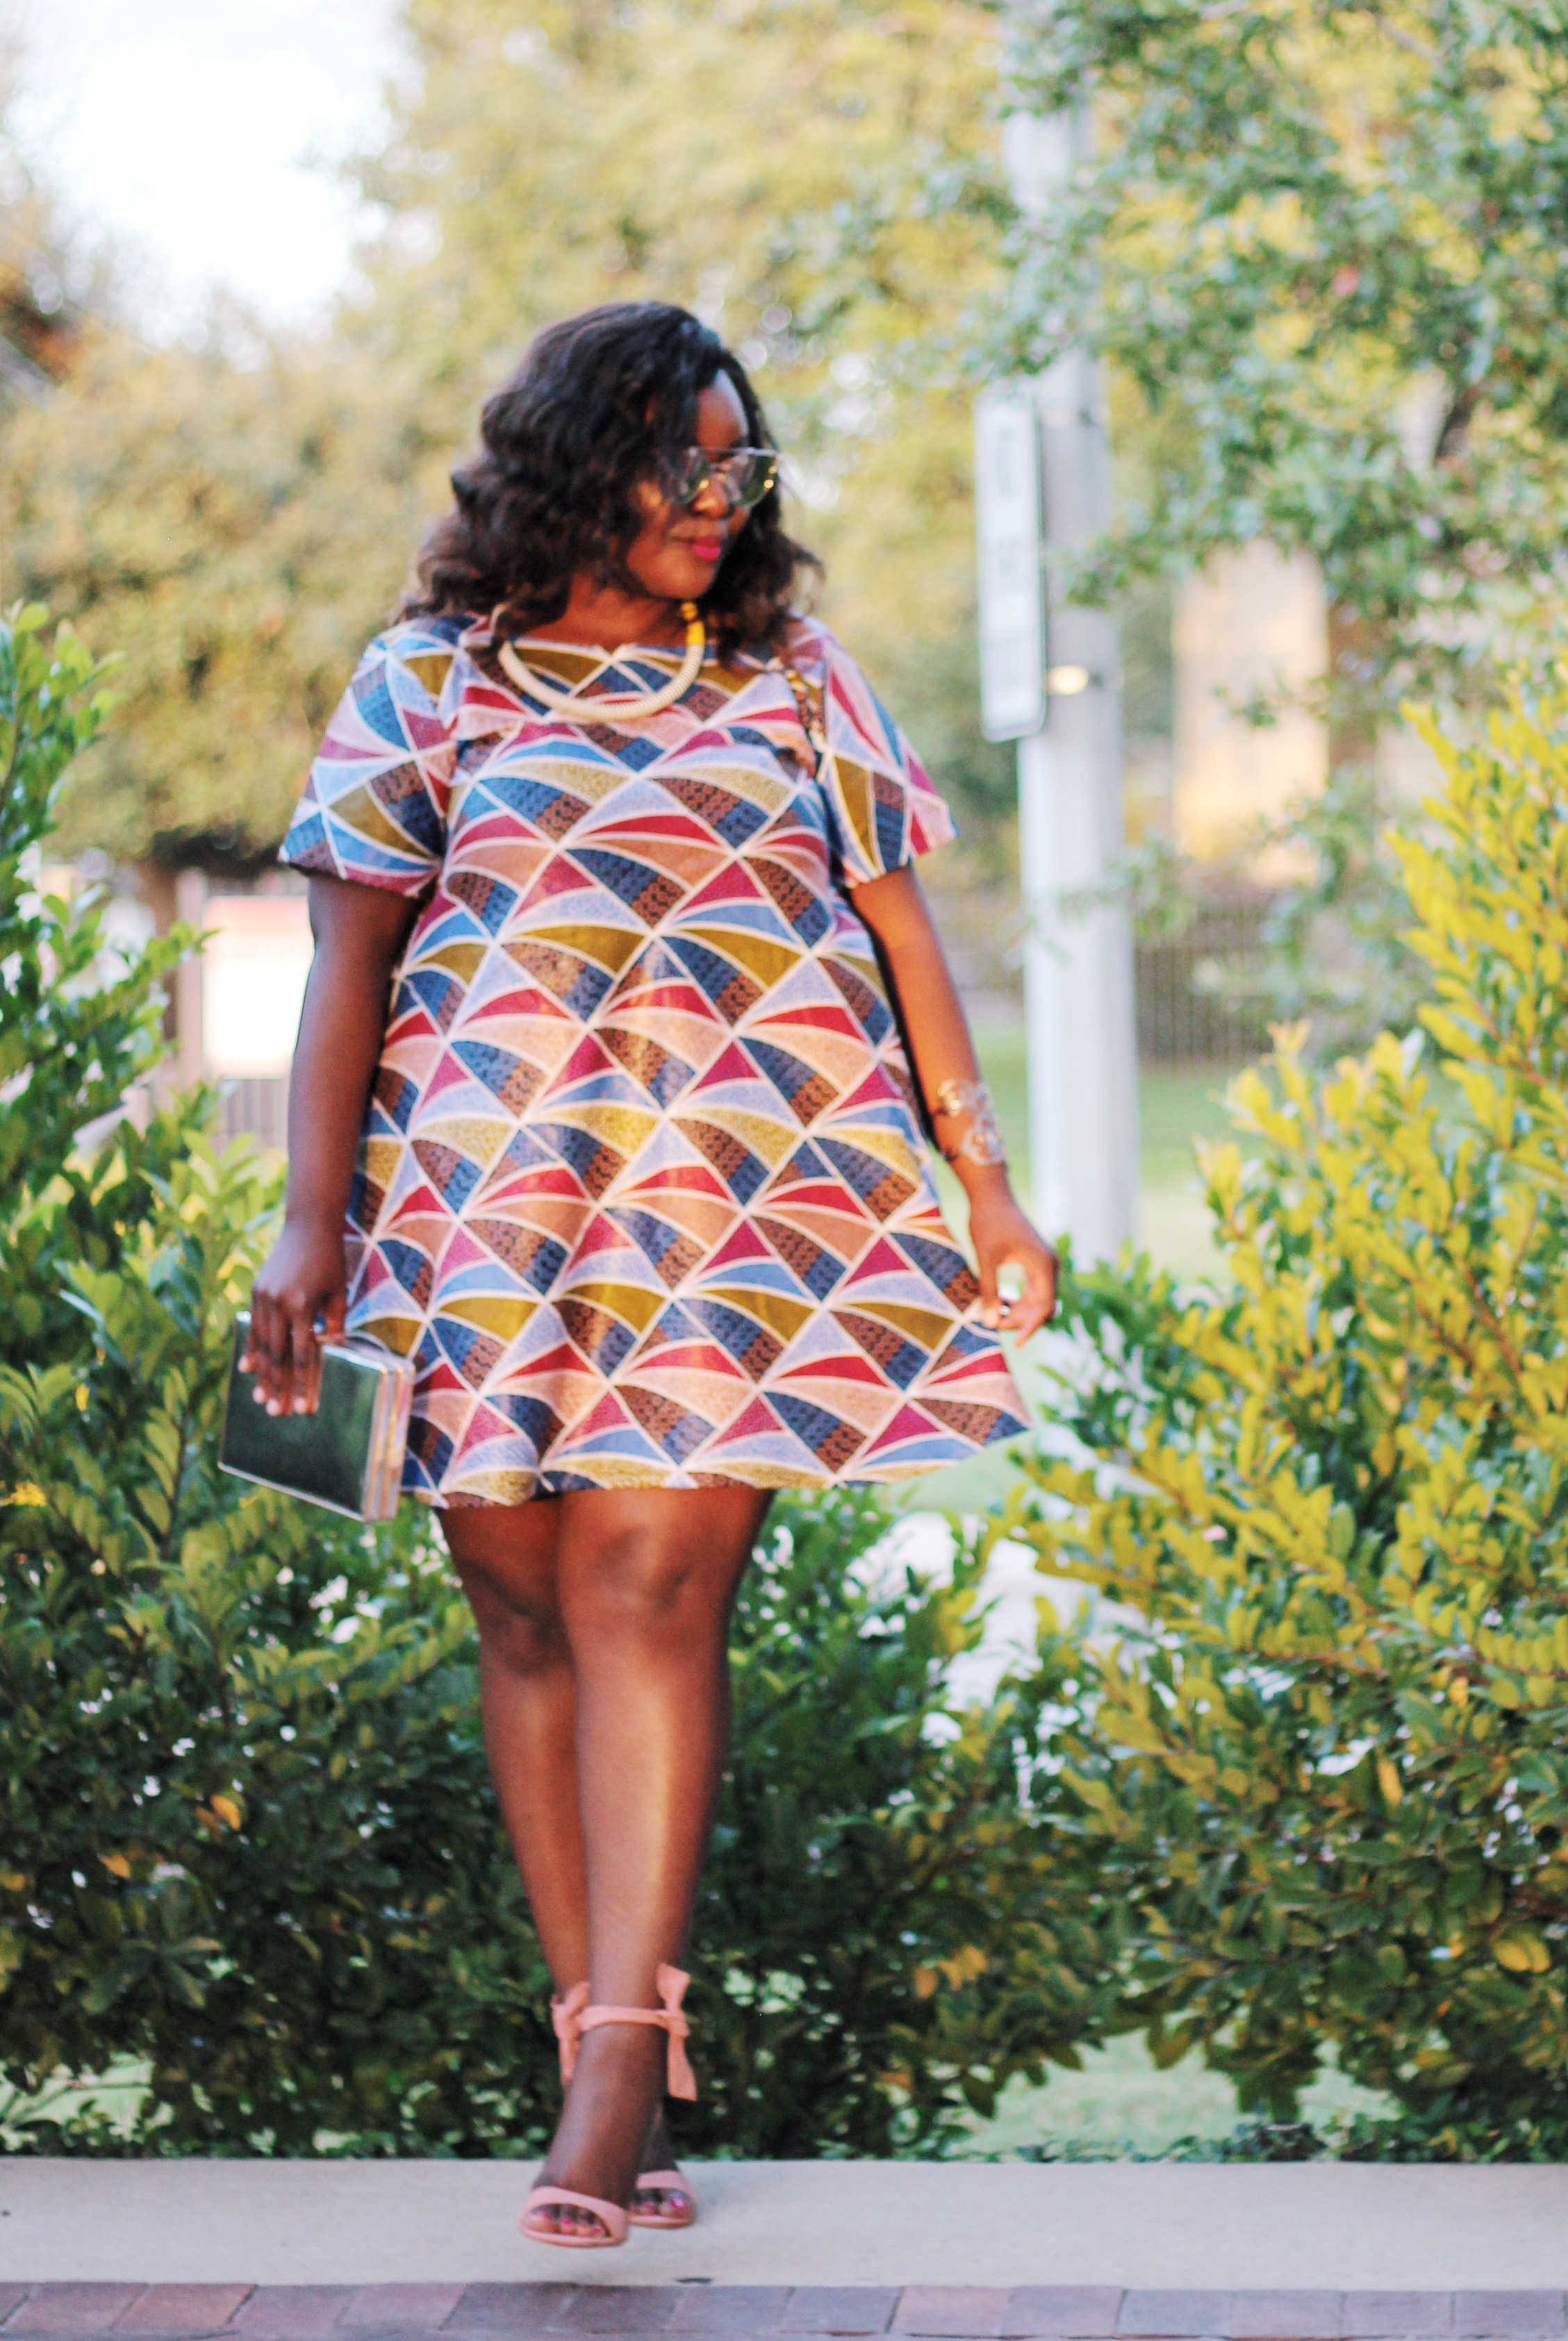 asos curve bloggers, beautiful curvy girls, curvy style dark skin fashion blogger curvy style blogger, dark skin beauty blogger, dark skin blogger, houston blogger, texas blogger, travel blogger, ugandan blogger, ugandan fashionista, ugandan style blogger, african print ankara skirt styles, where to get african print clothes in America and uk, exposure african crafts in kampala uganda, kyaligonza kampala african material, Steve Madden Bowwtye Heel Sandal